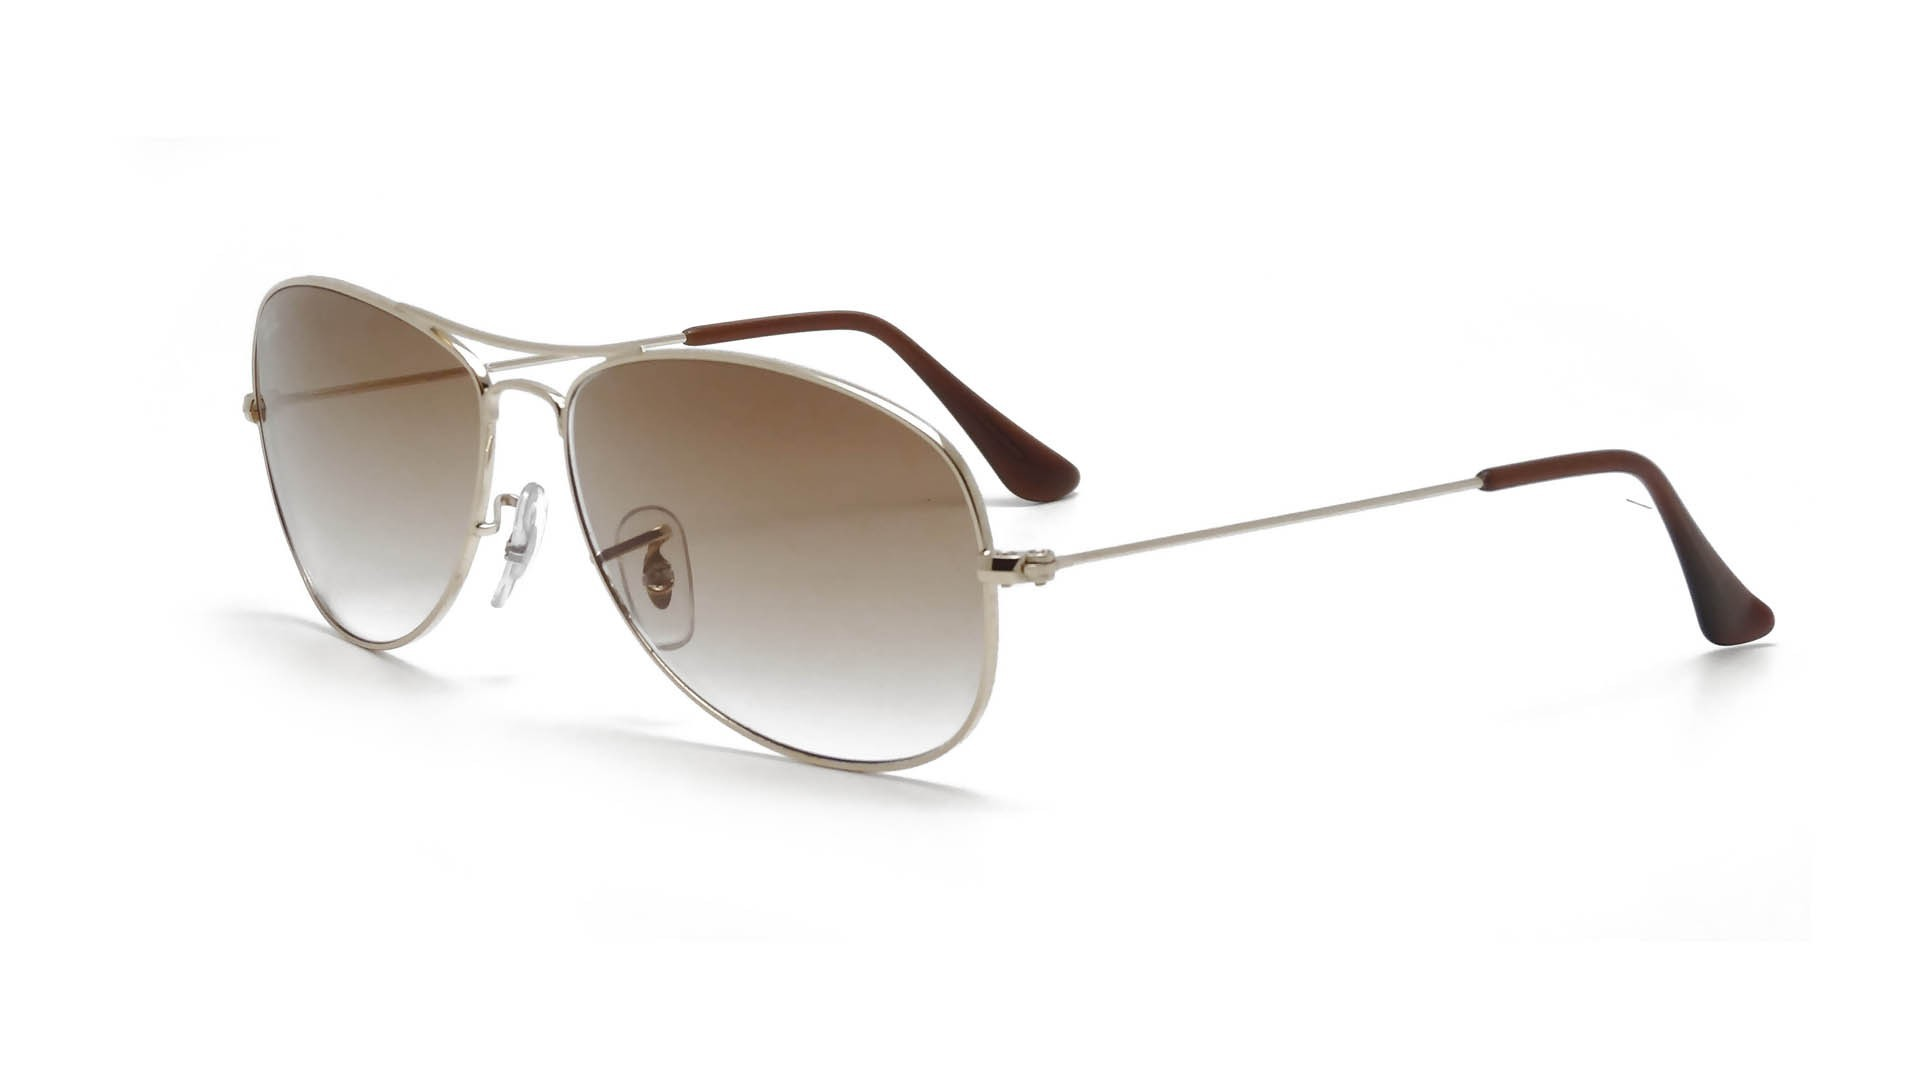 e3e6351791 Sunglasses Ray-Ban Cockpit Gold RB3362 001 51 56-14 Large Gradient